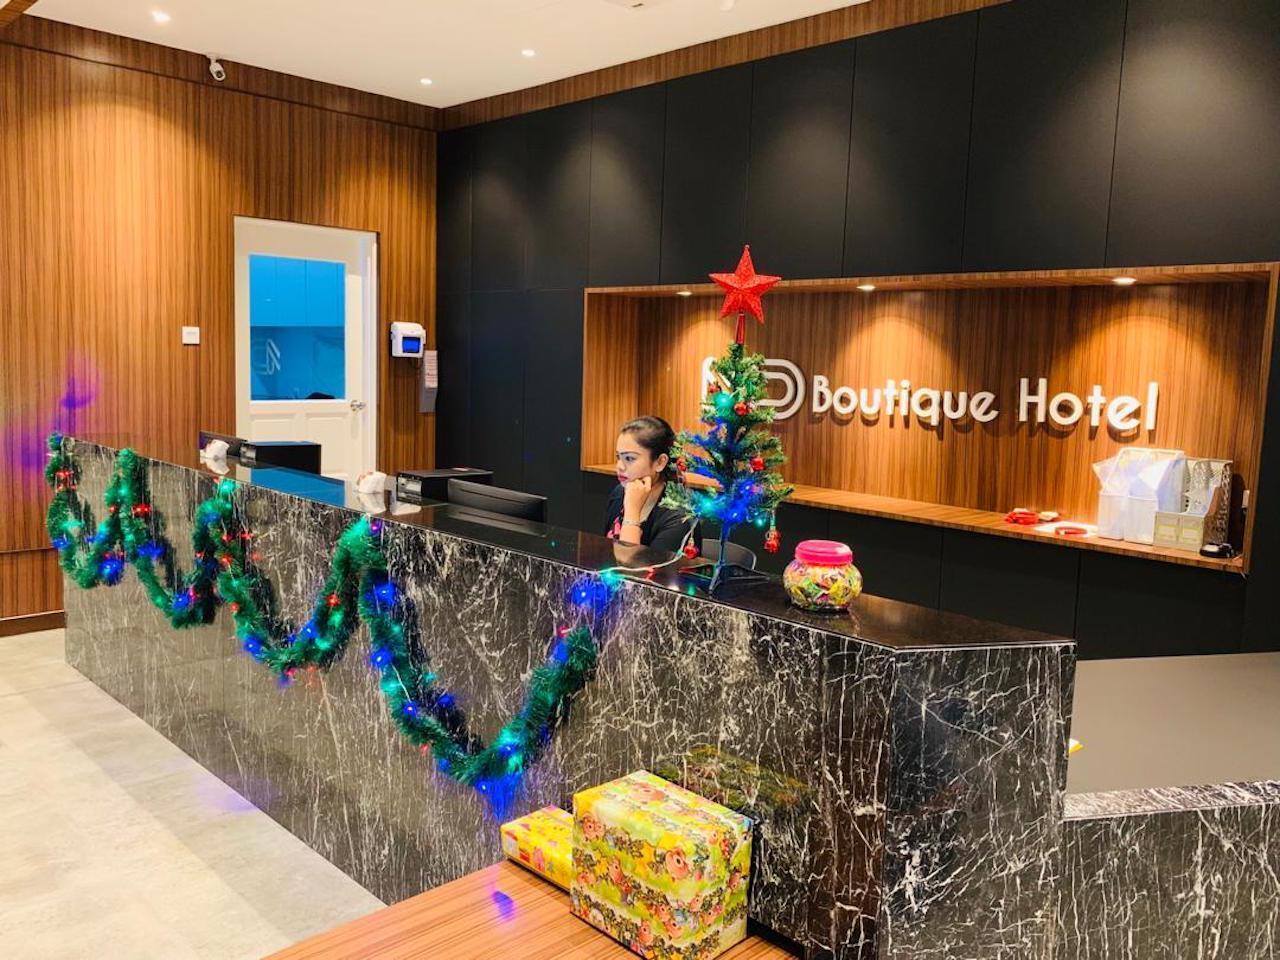 MD Boutique Hotel, Kinta